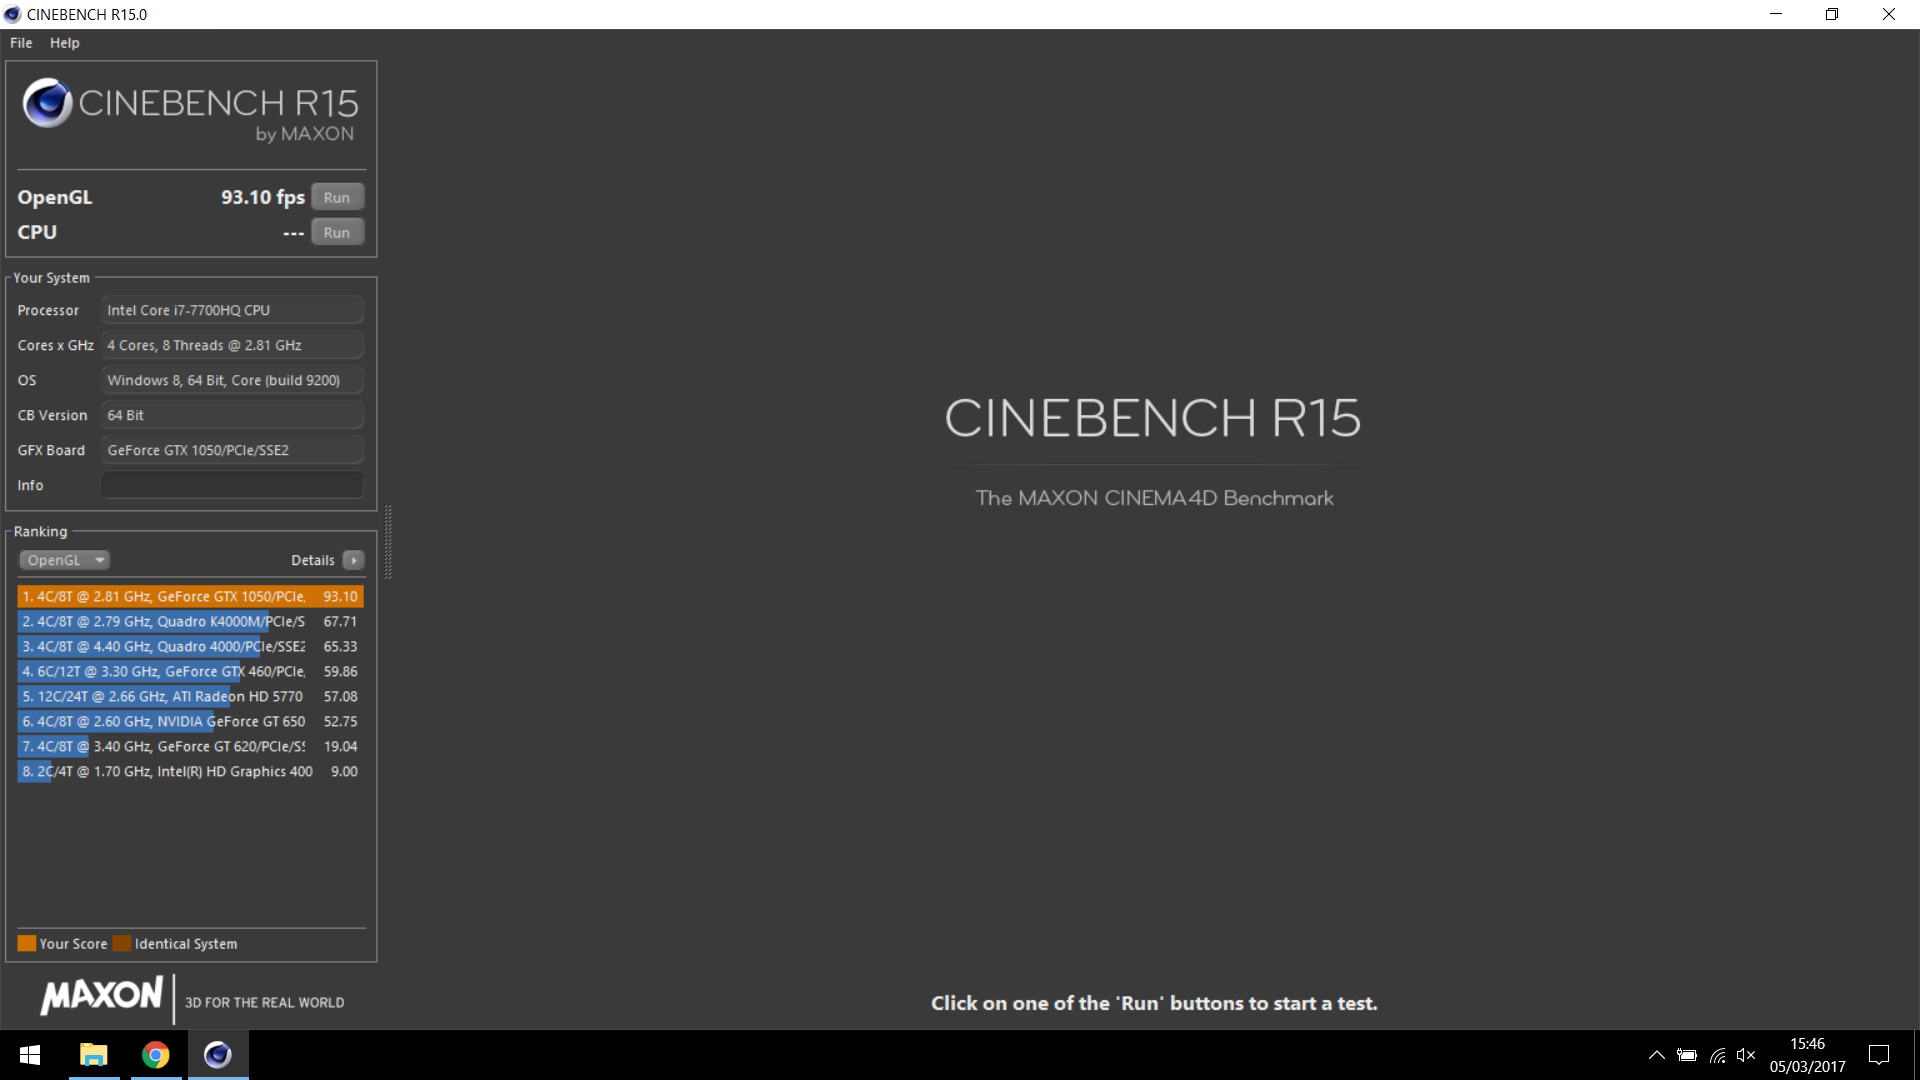 CINEBENCH R15 OpenGL - GPU Test benchmarks